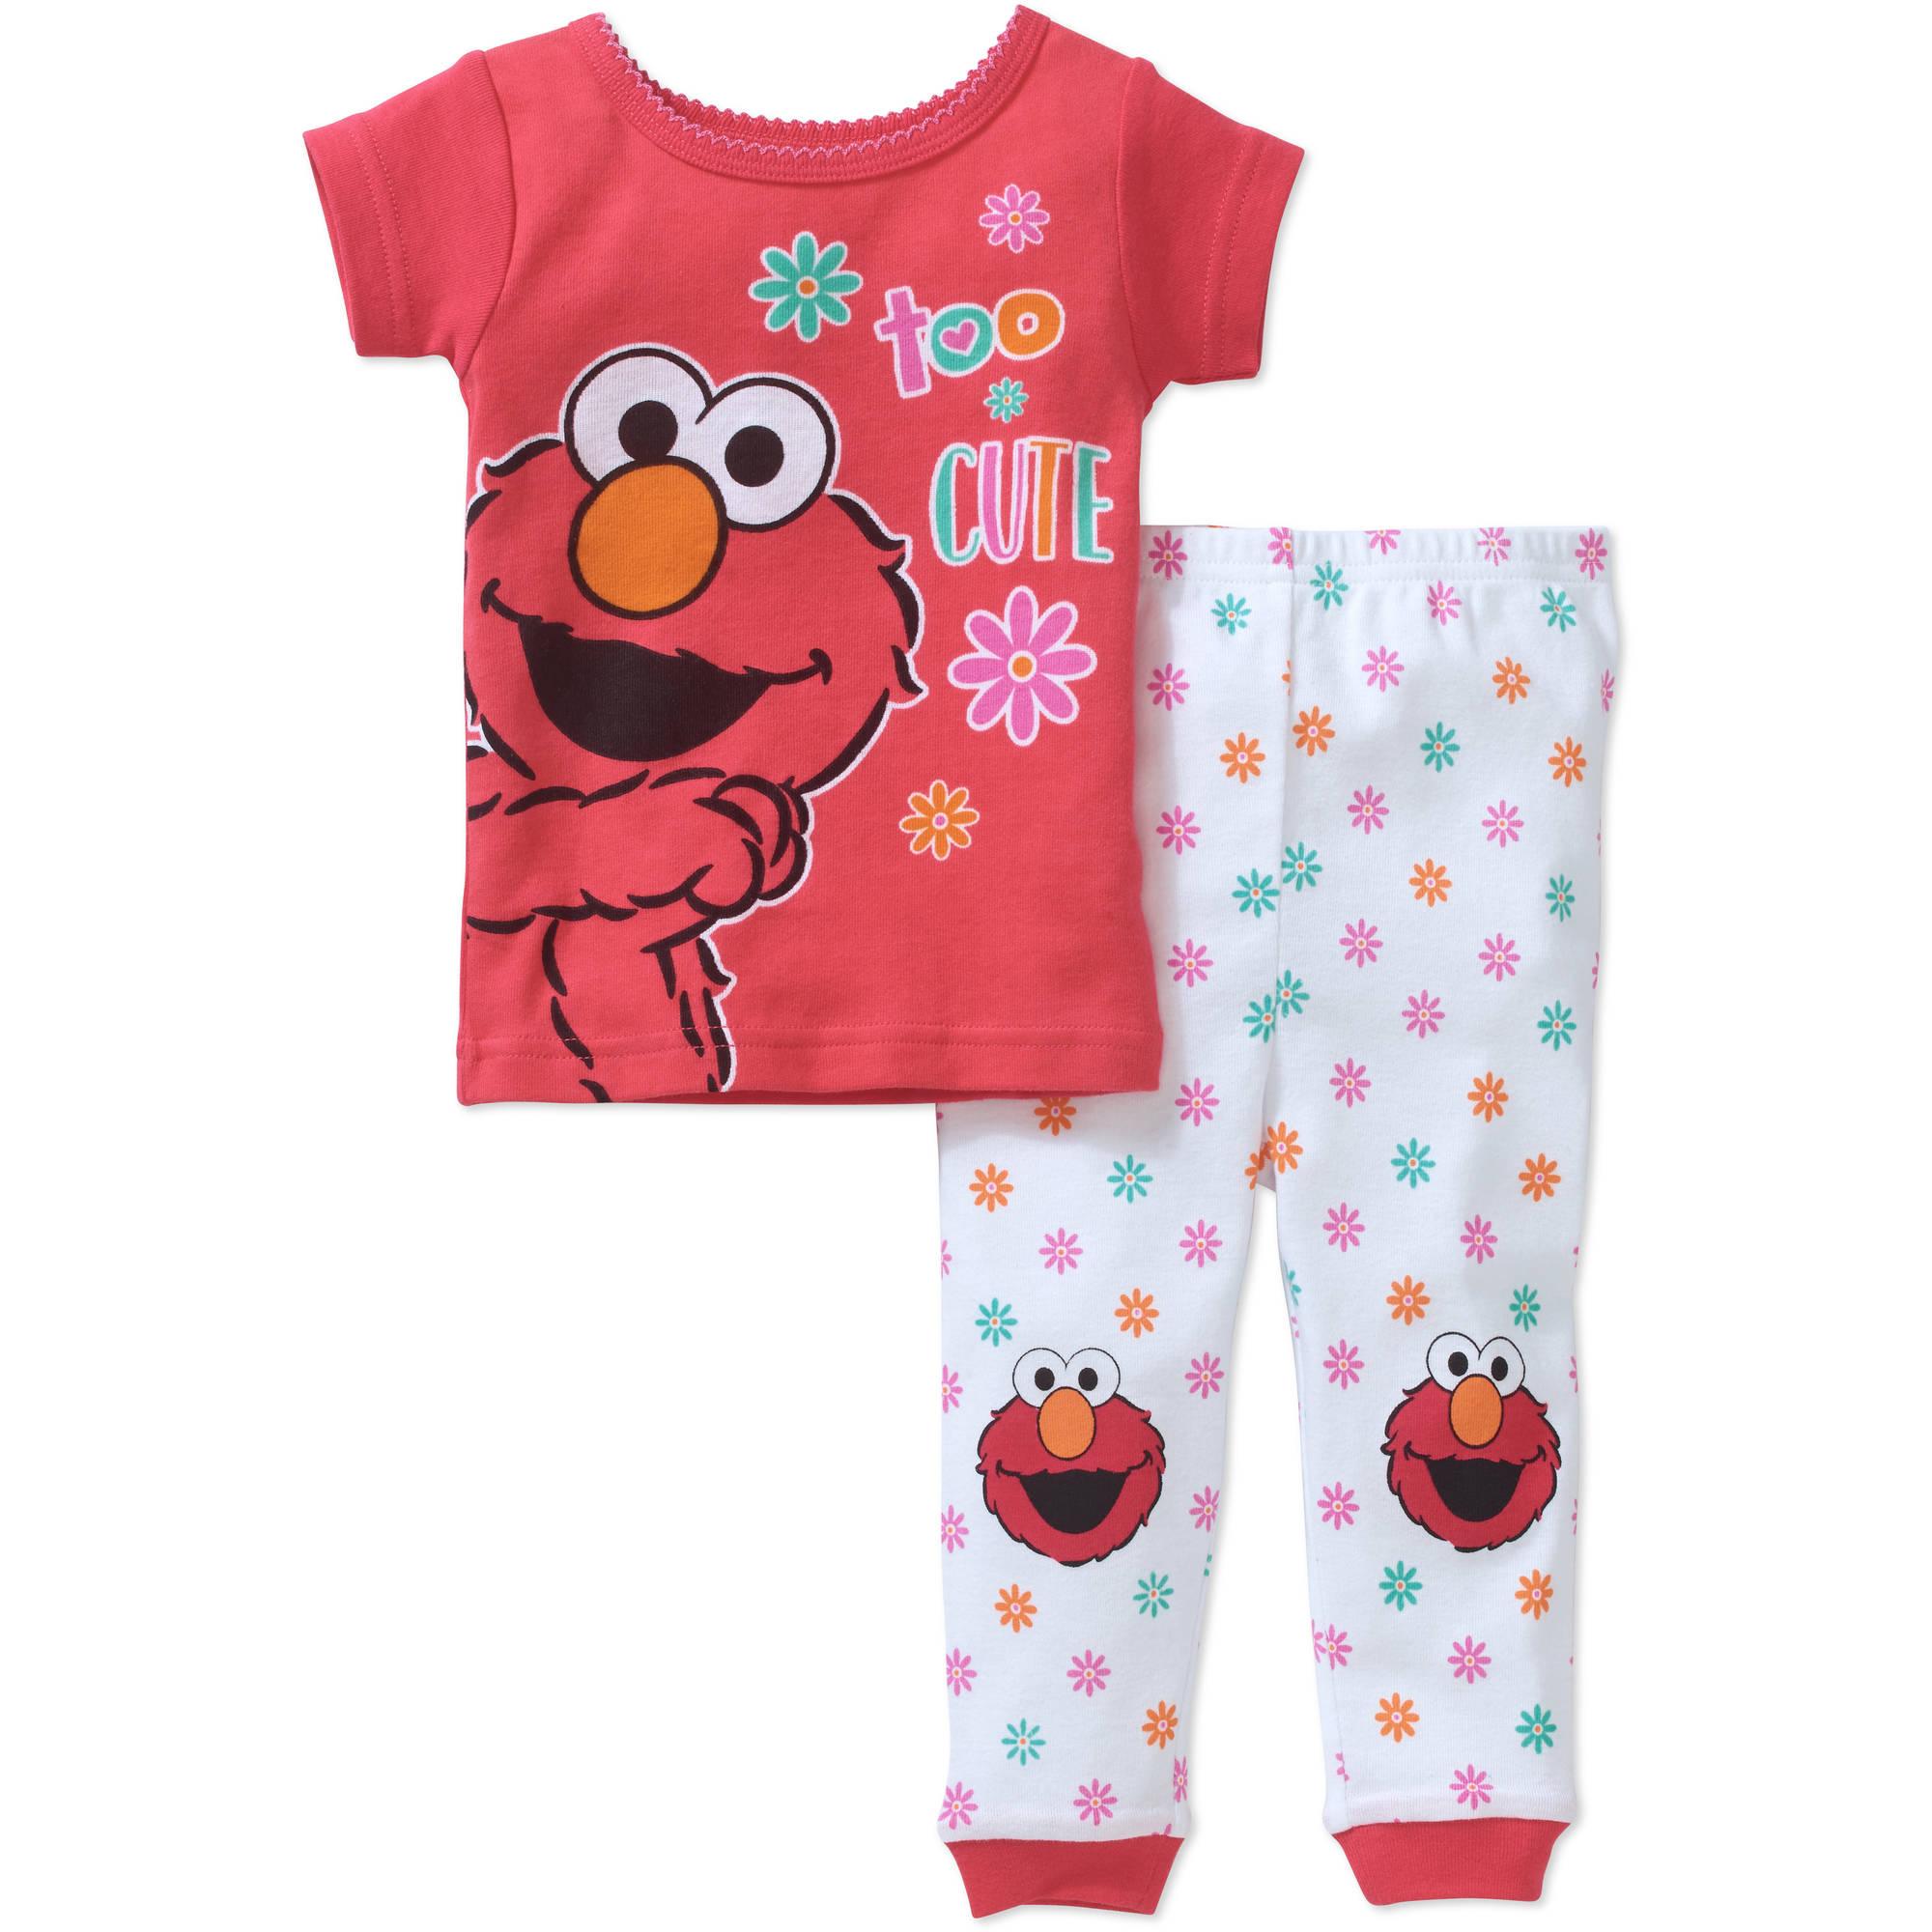 Sesame Street Newborn Baby Girl Elmo Cotton Tight Fit